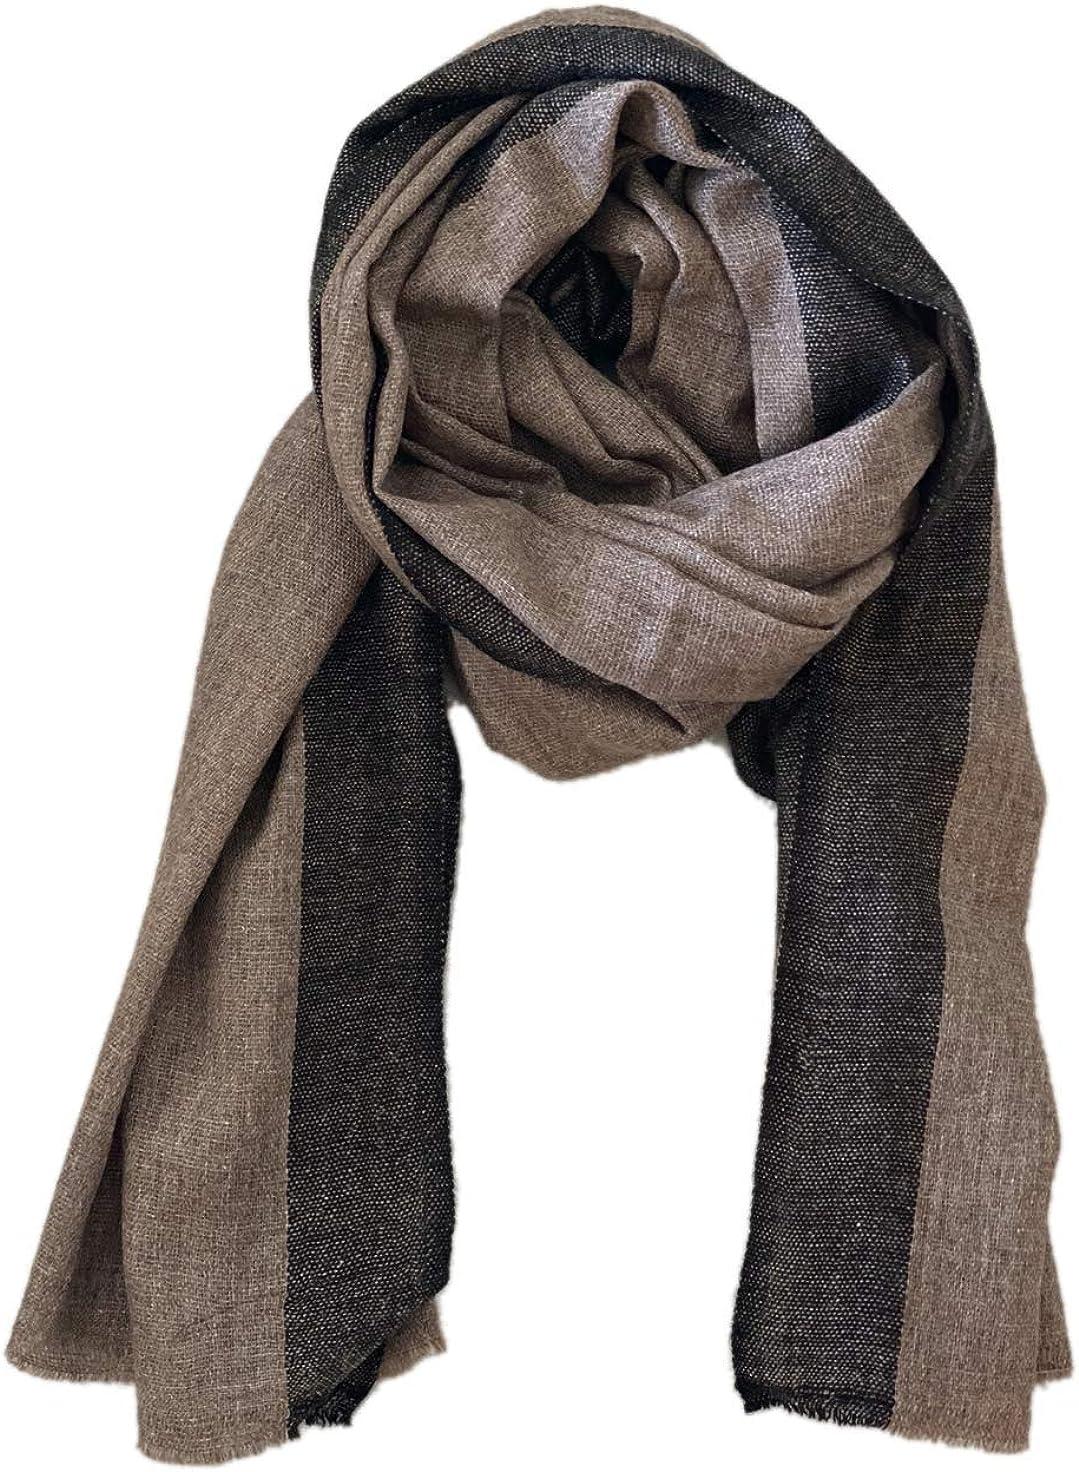 Stole Kani Pashmina Shawl Scarf 100/% Wool Shafis By Gazala